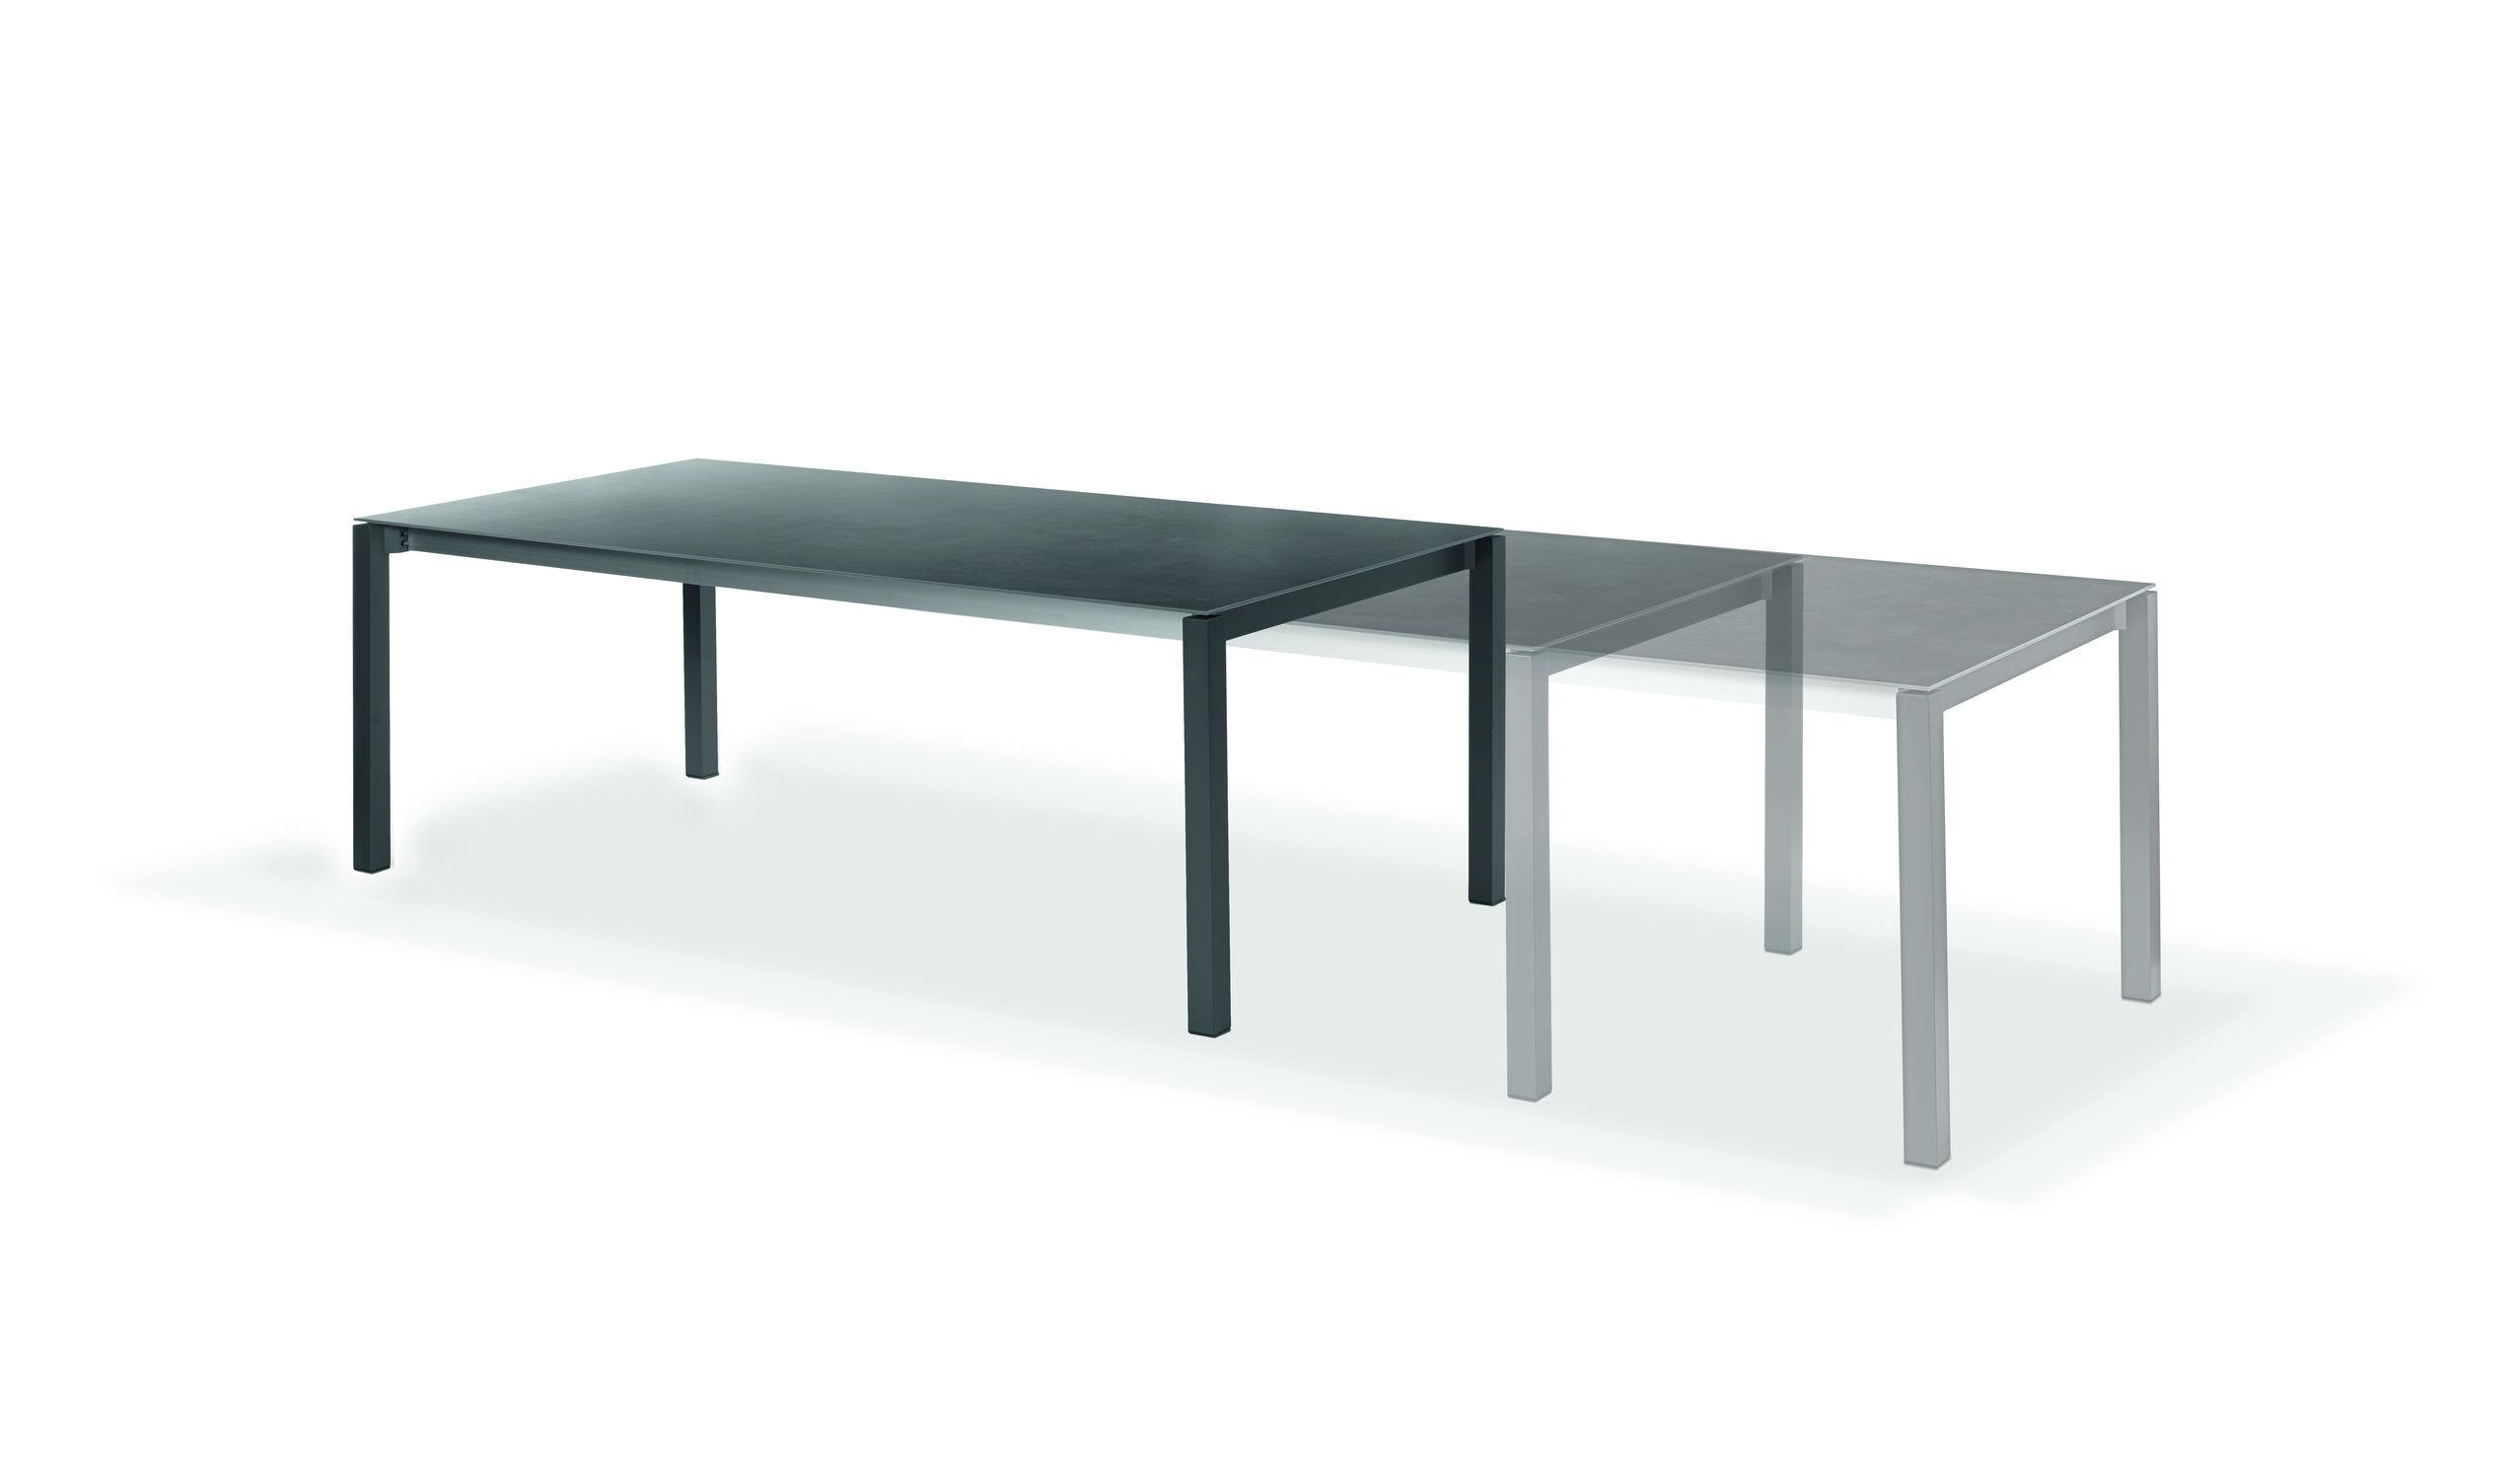 Contemporary dining table cement teak laminate RIO